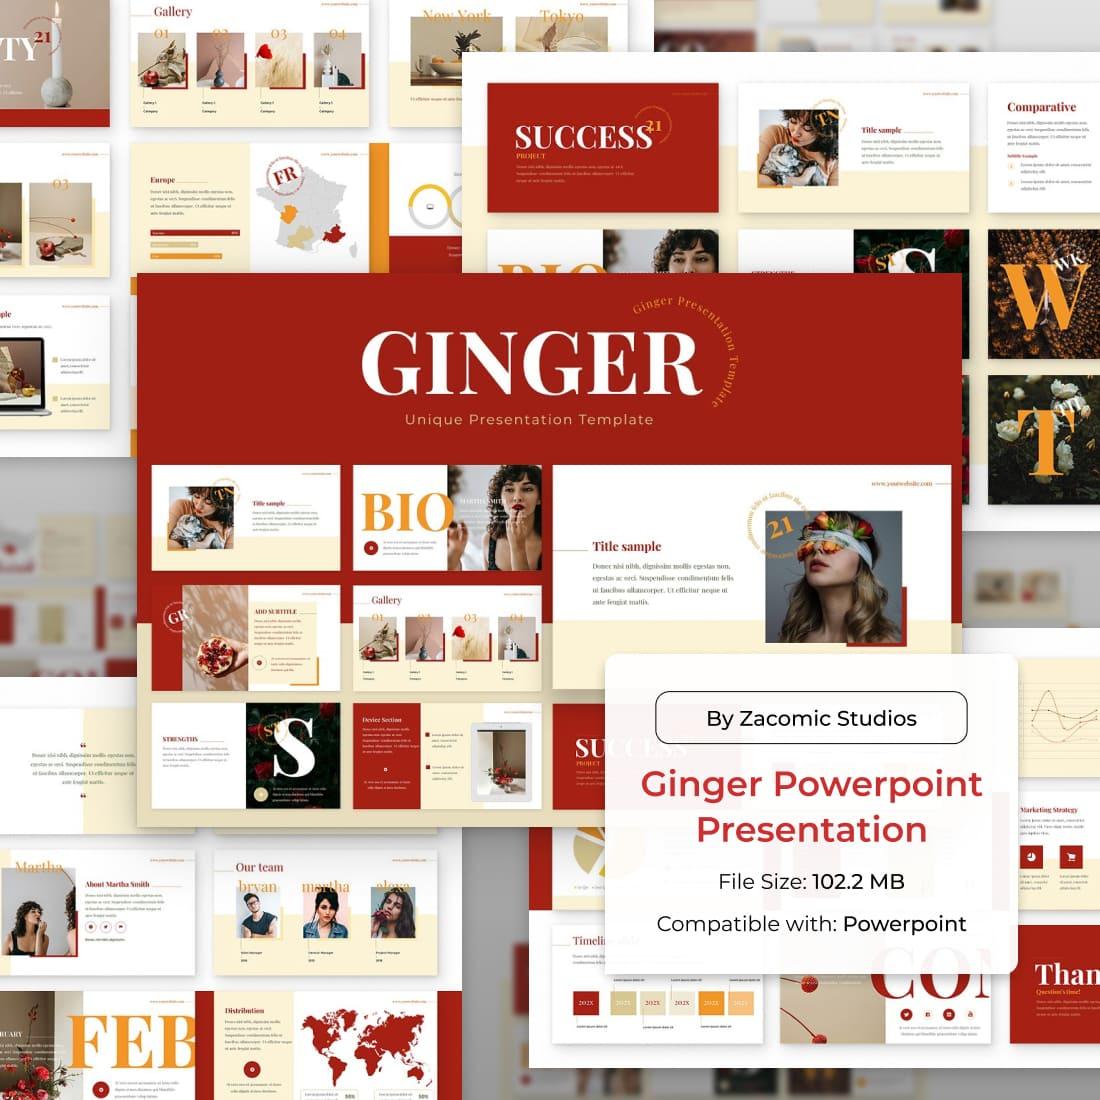 Ginger Powerpoint Presentation Template by MasterBundles.